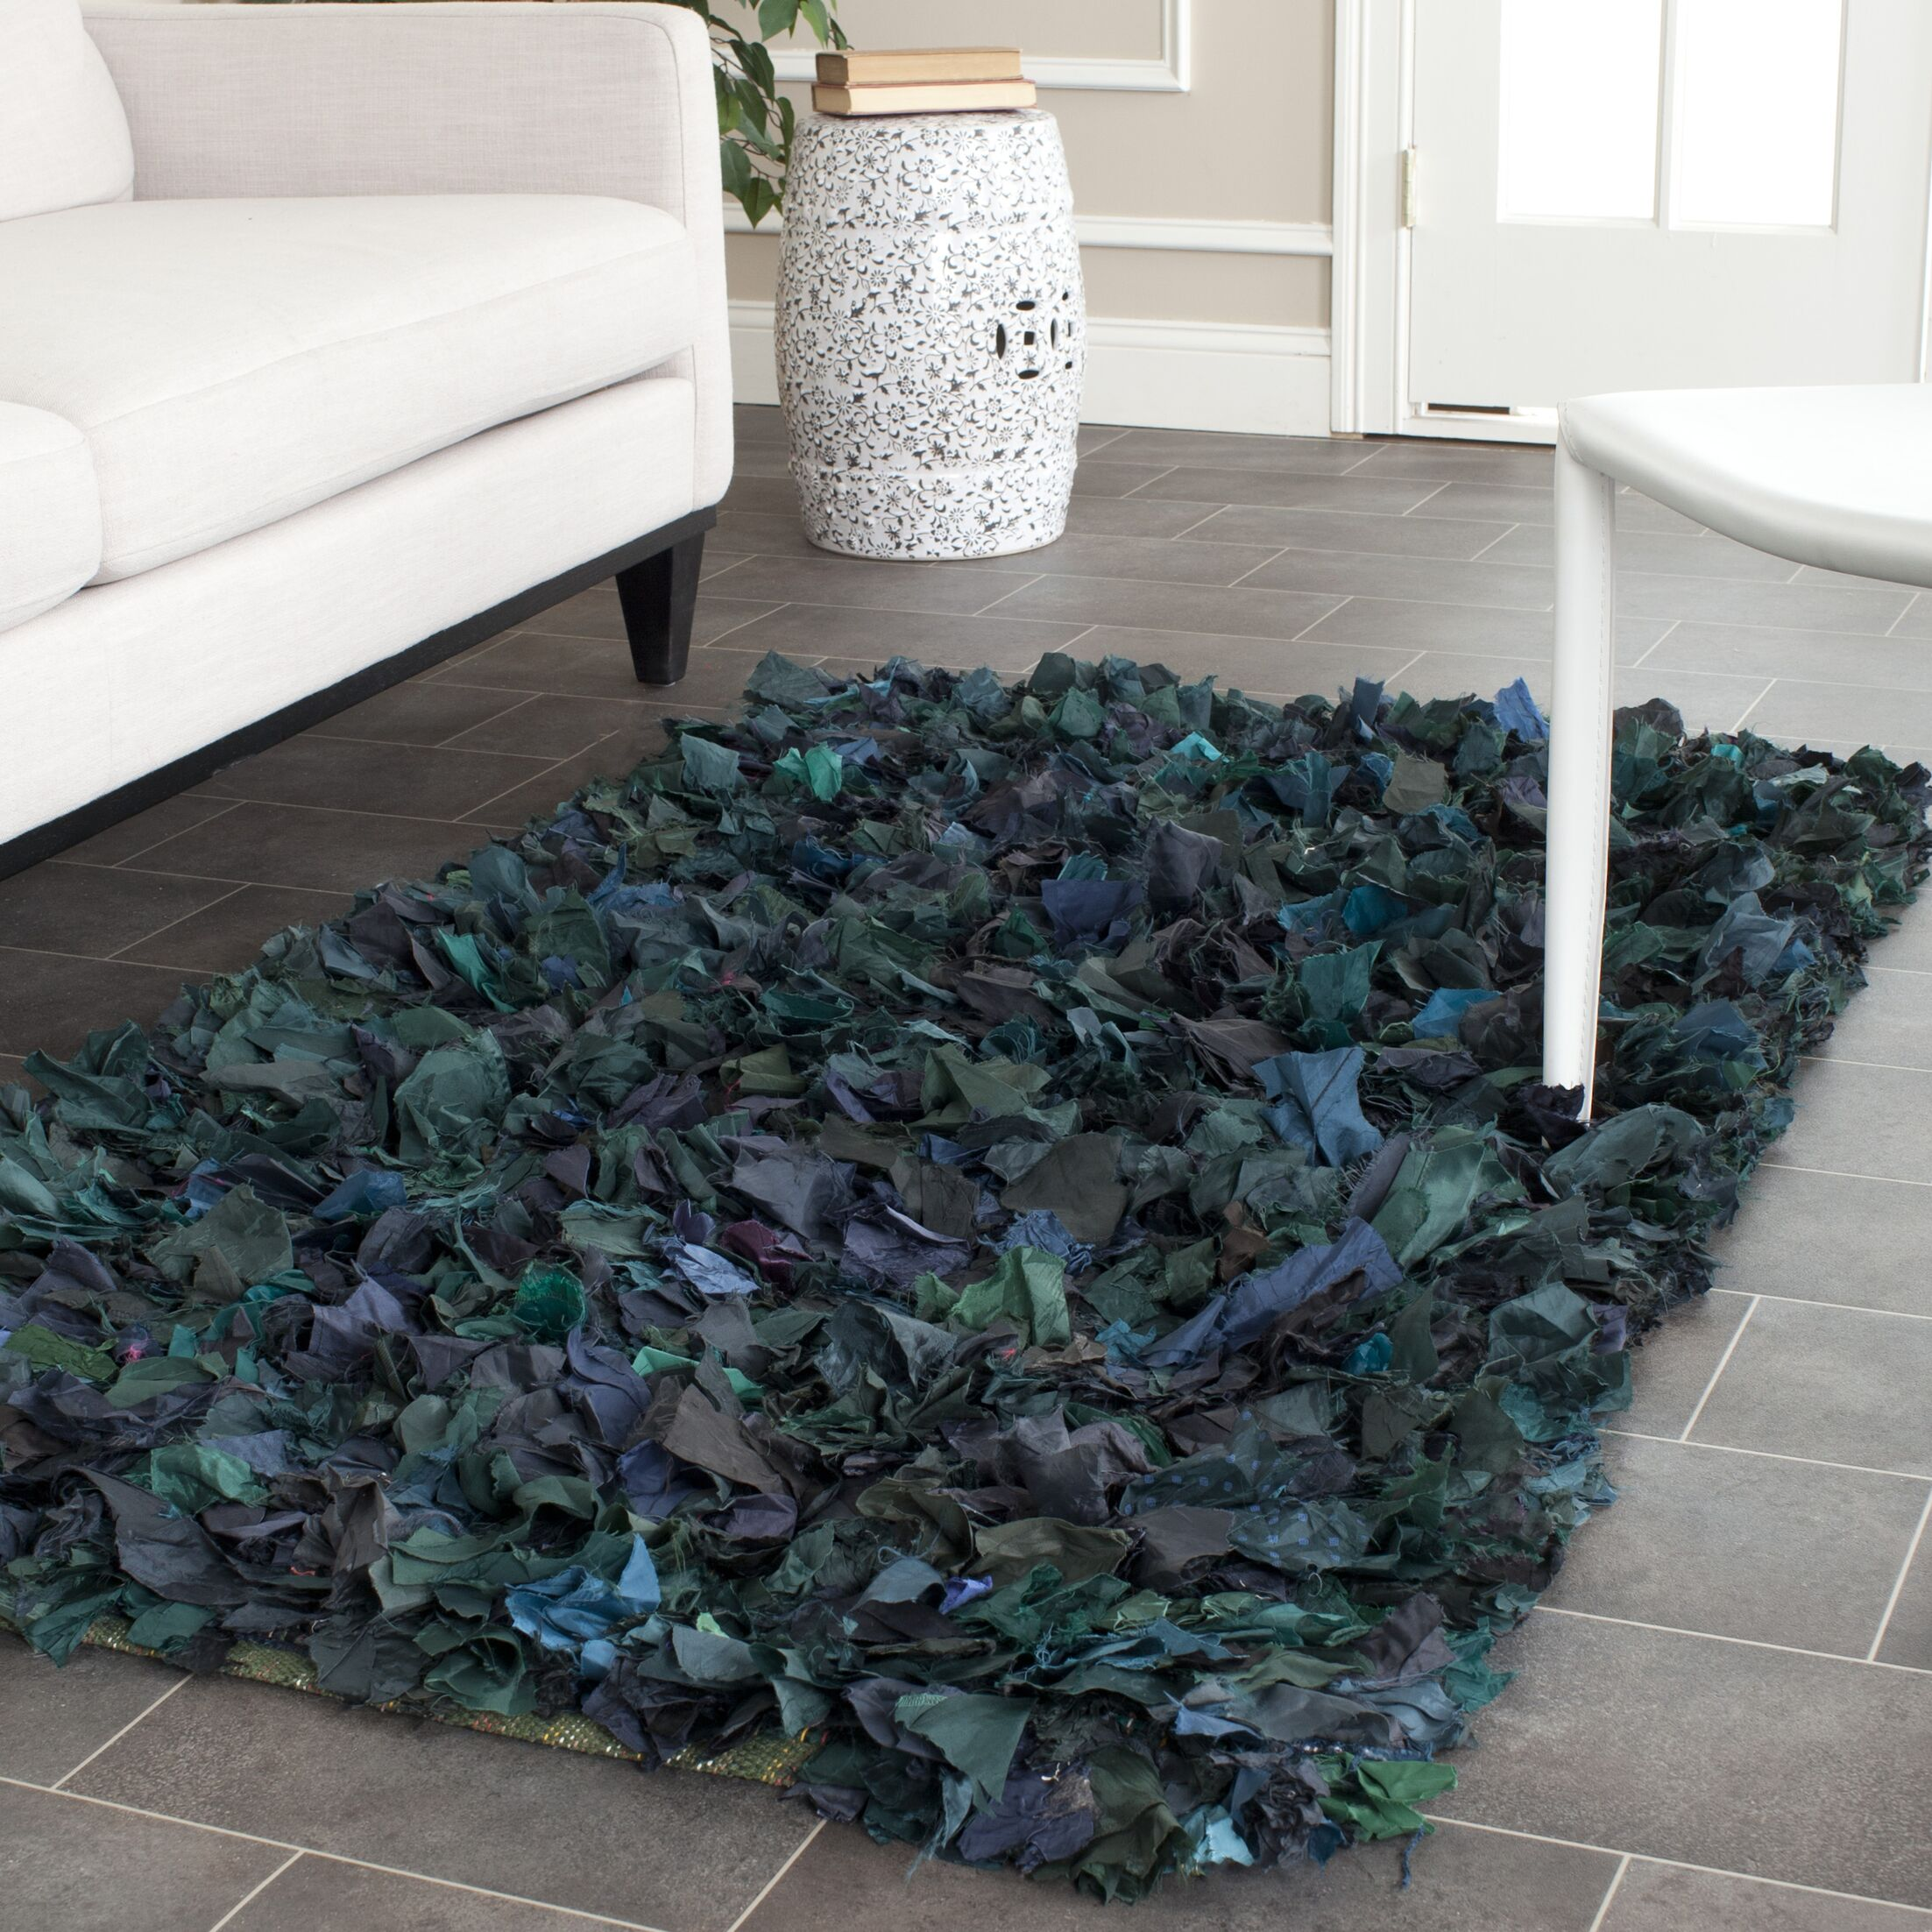 Messiah Green Shag Area Rug Rug Size: Rectangle 5' x 8'